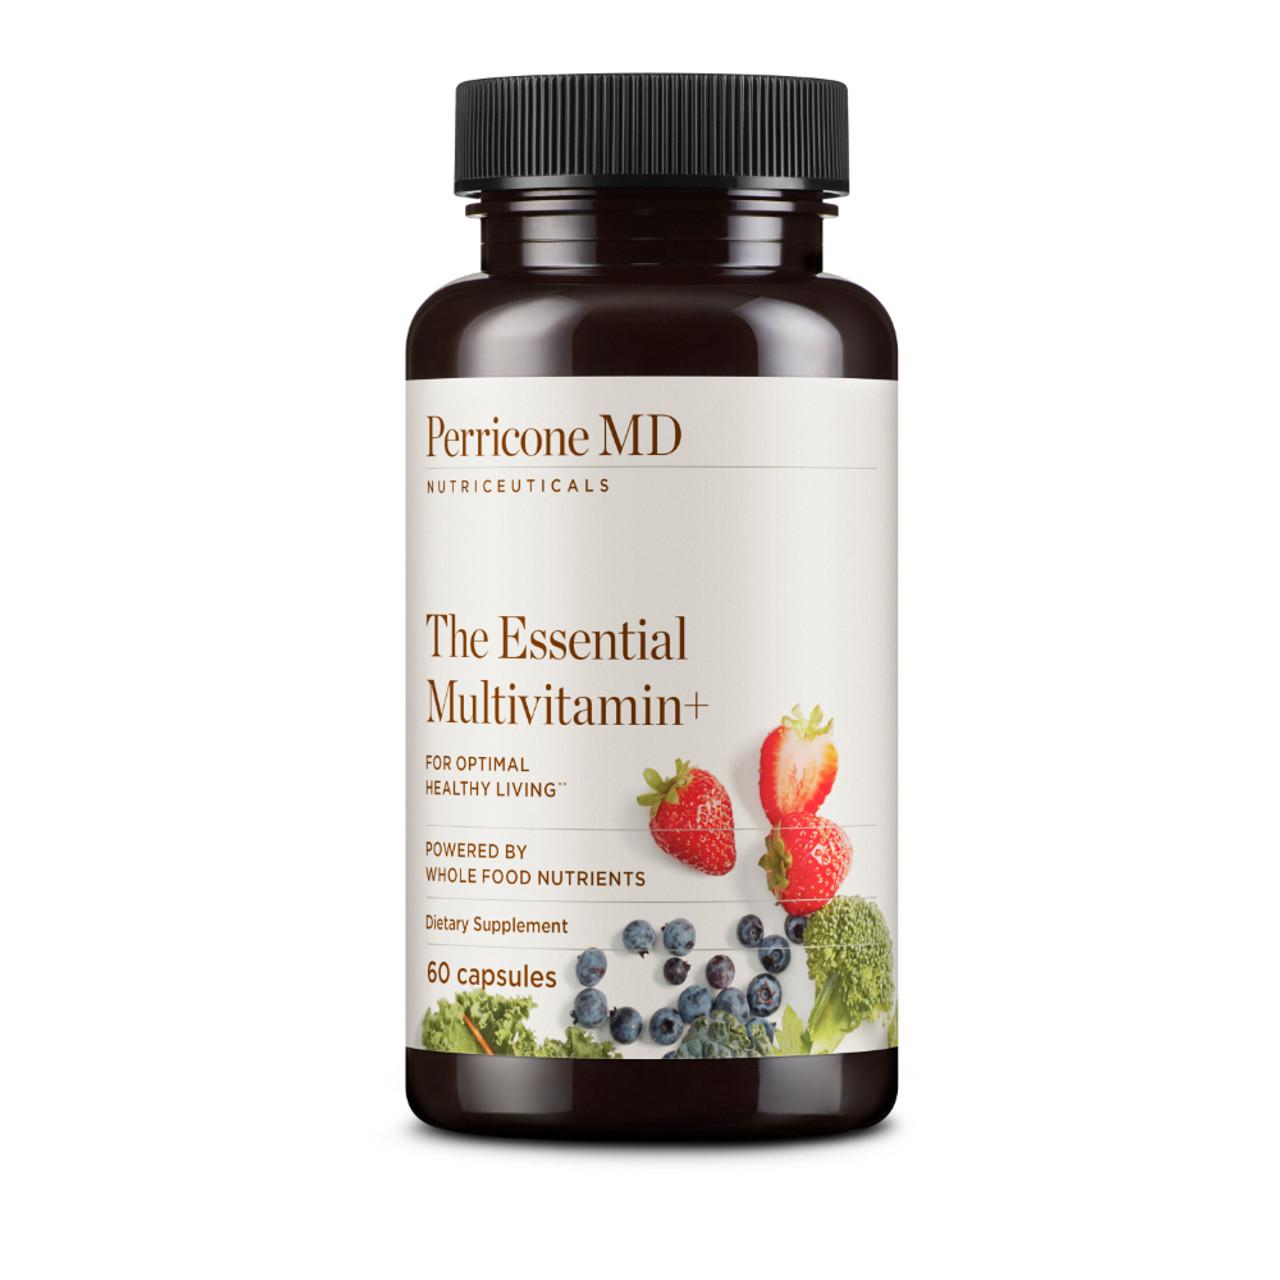 Perricone MD Essential Multivitamin